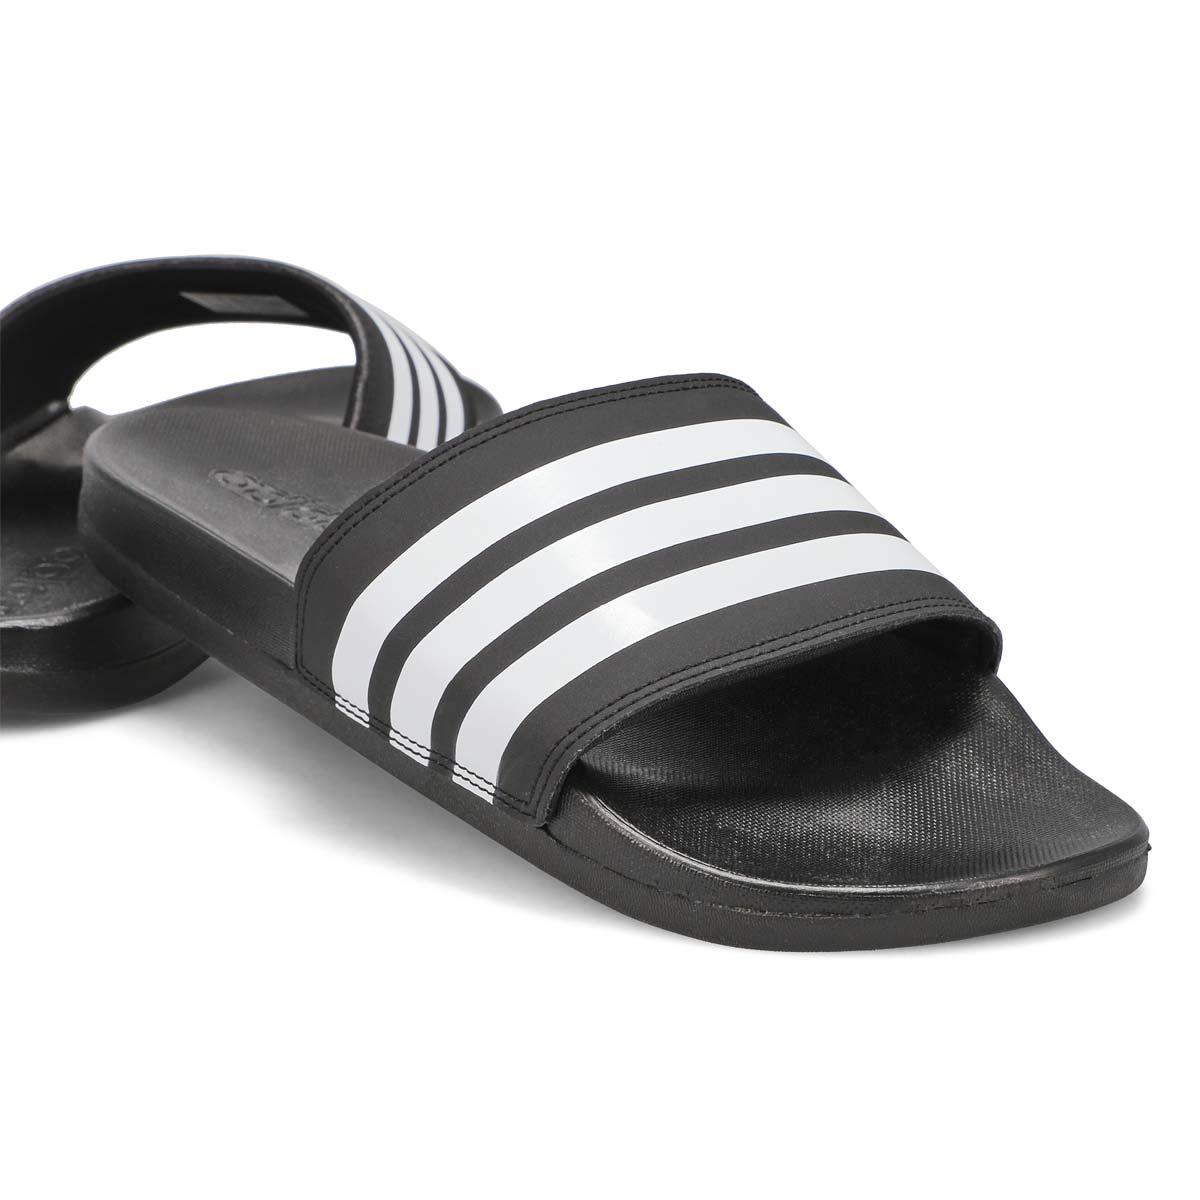 Women's Adilette CF+ Stripes W Slide - Black/White